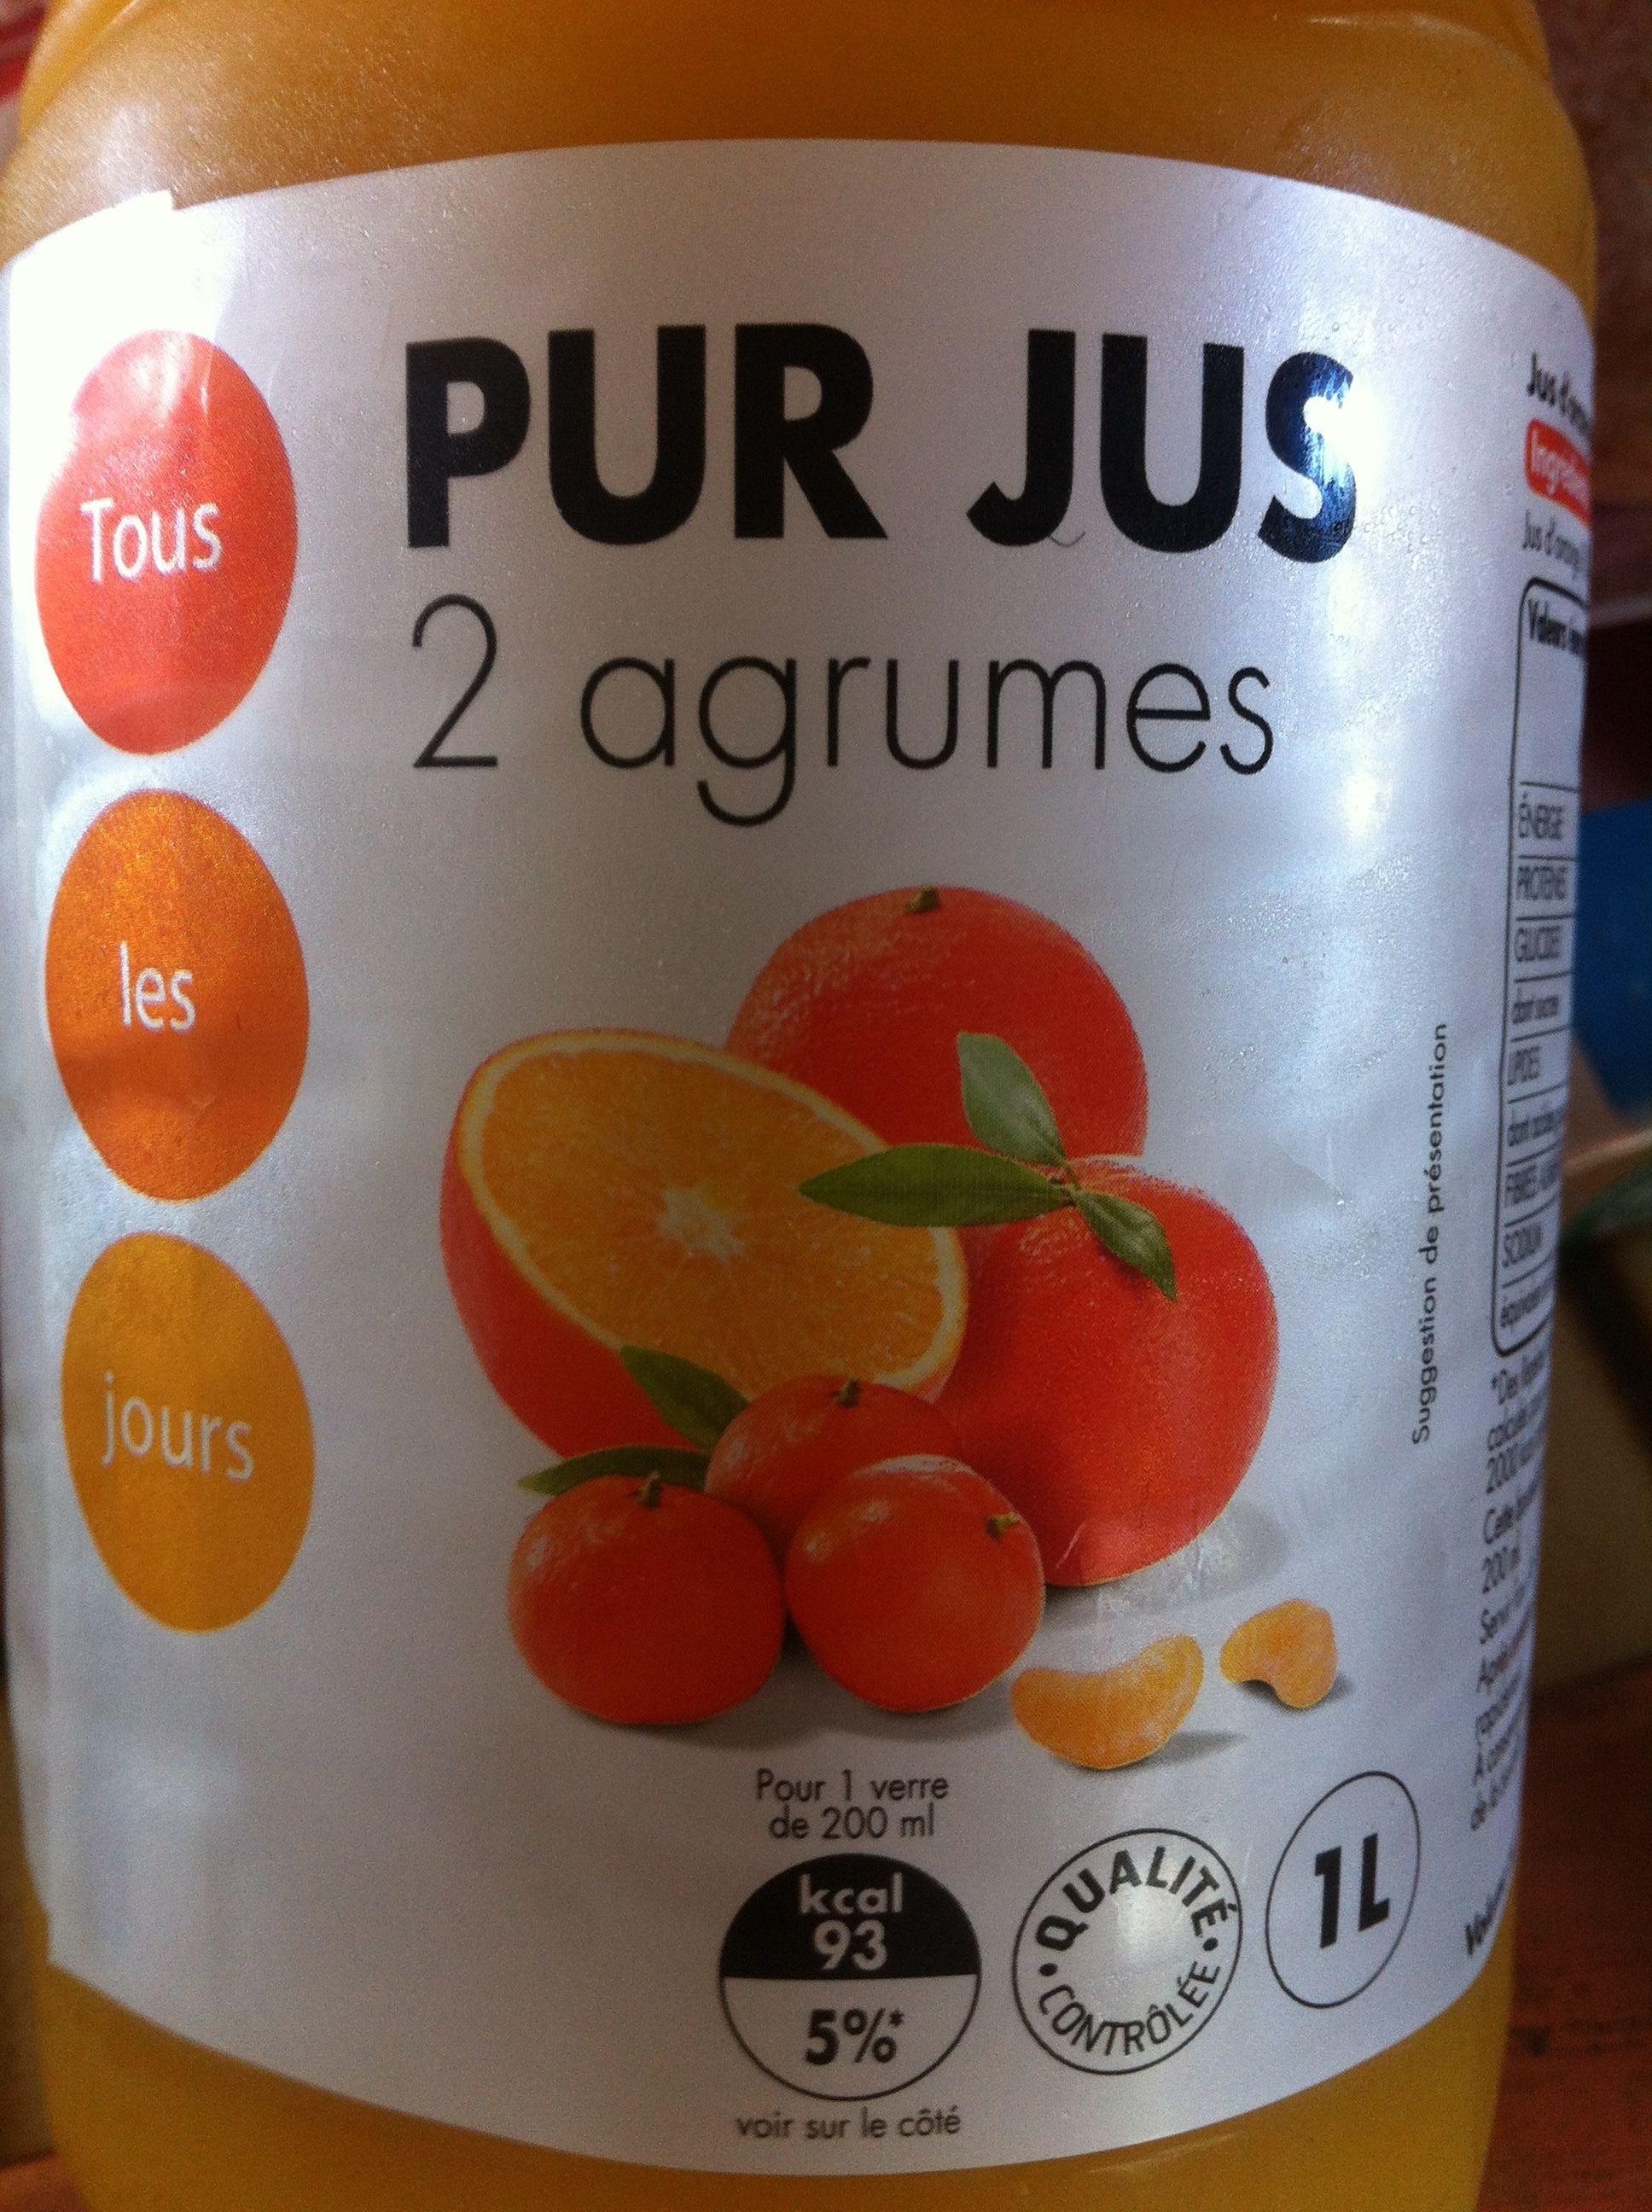 Pur Jus 2 agrumes - Produit - fr